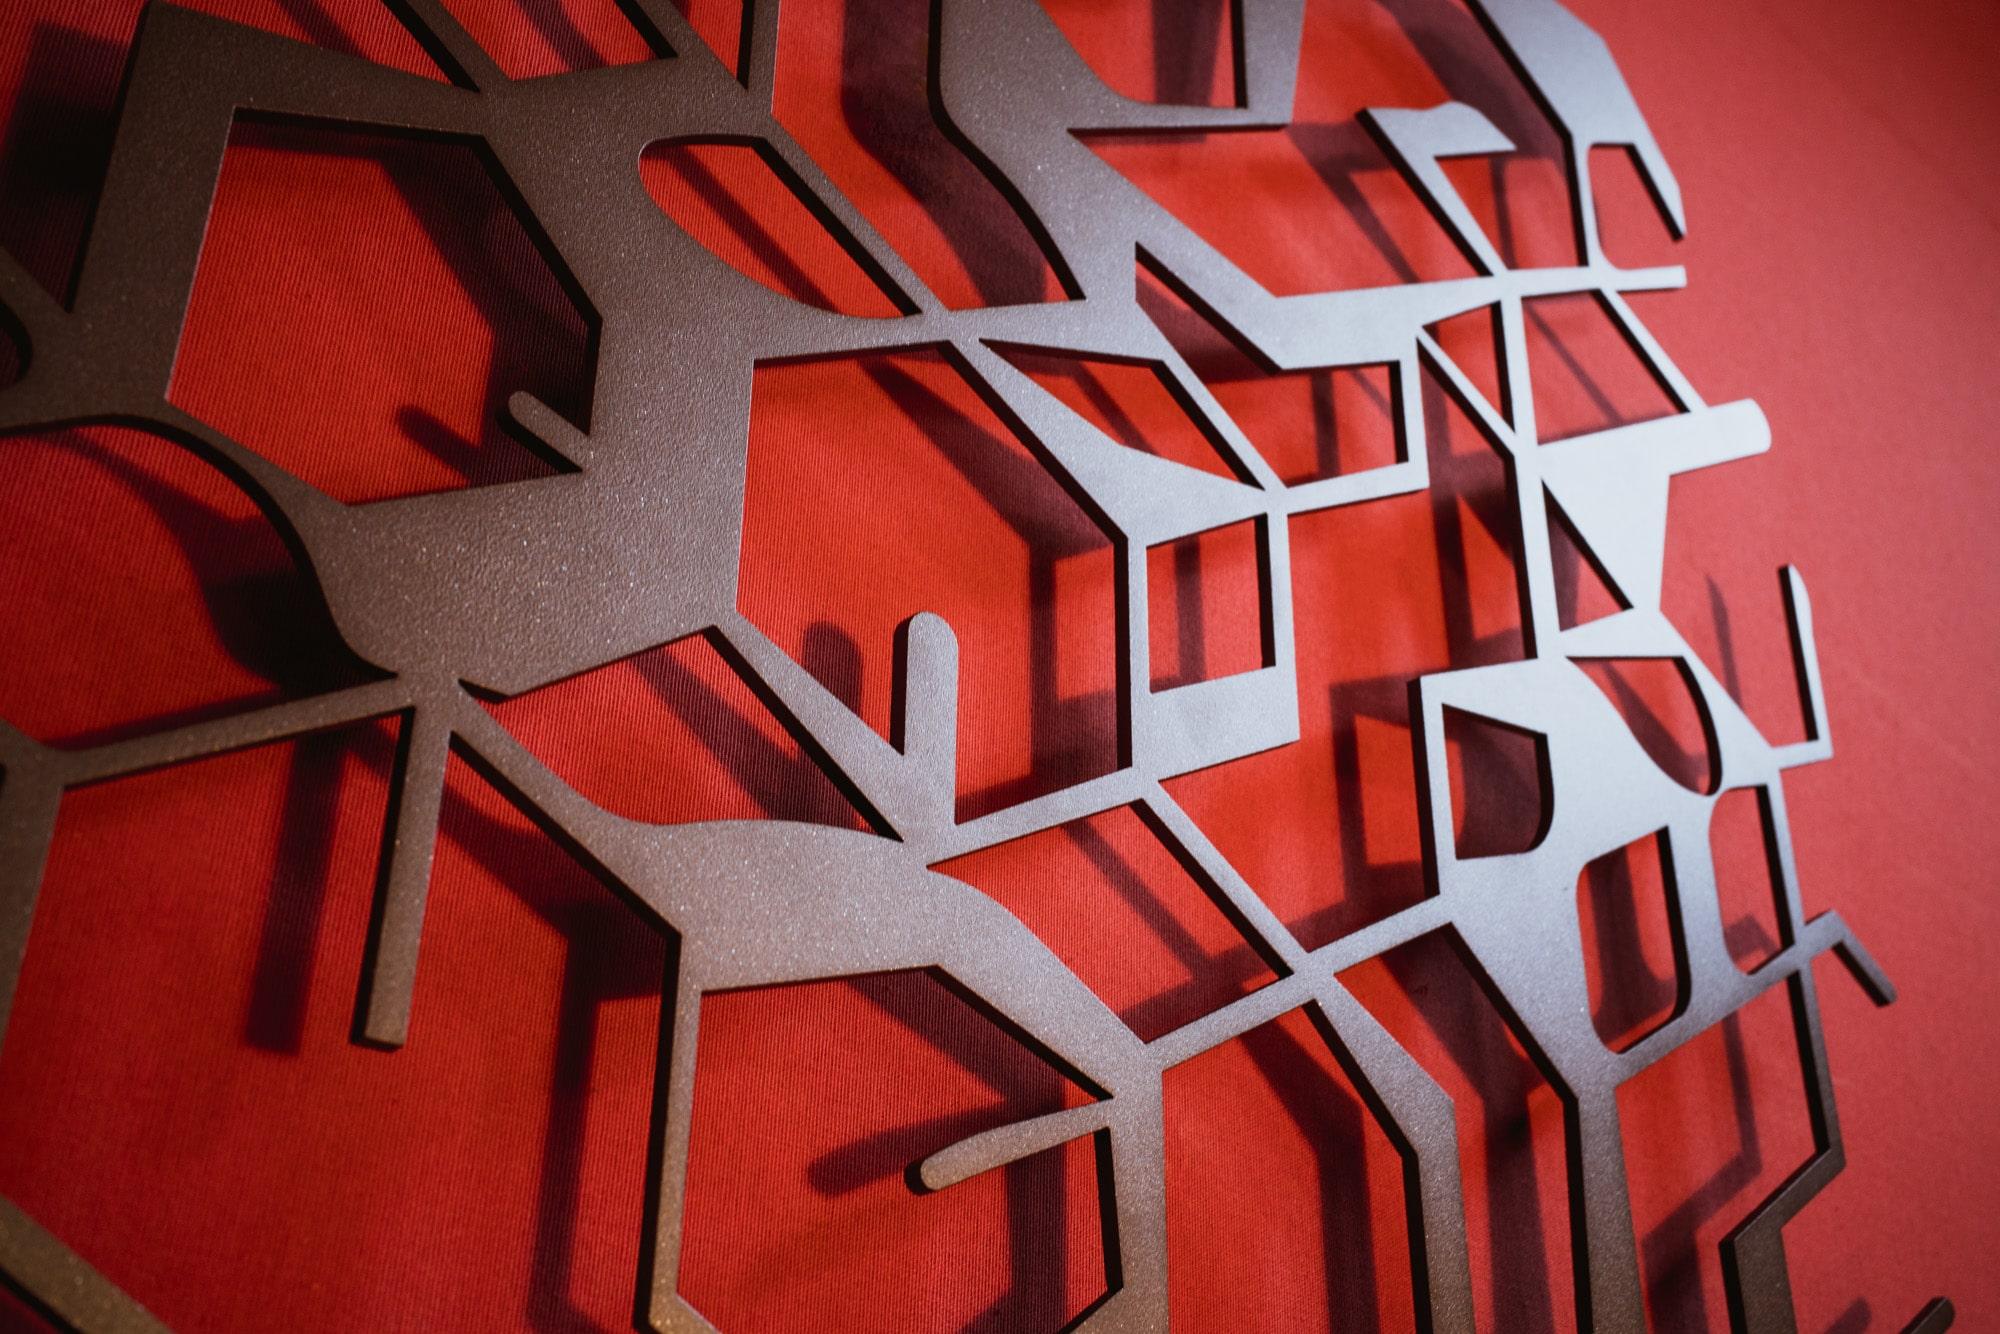 2 Light On Studio - Packshot Photo De Produit - Marseille 13 PACA